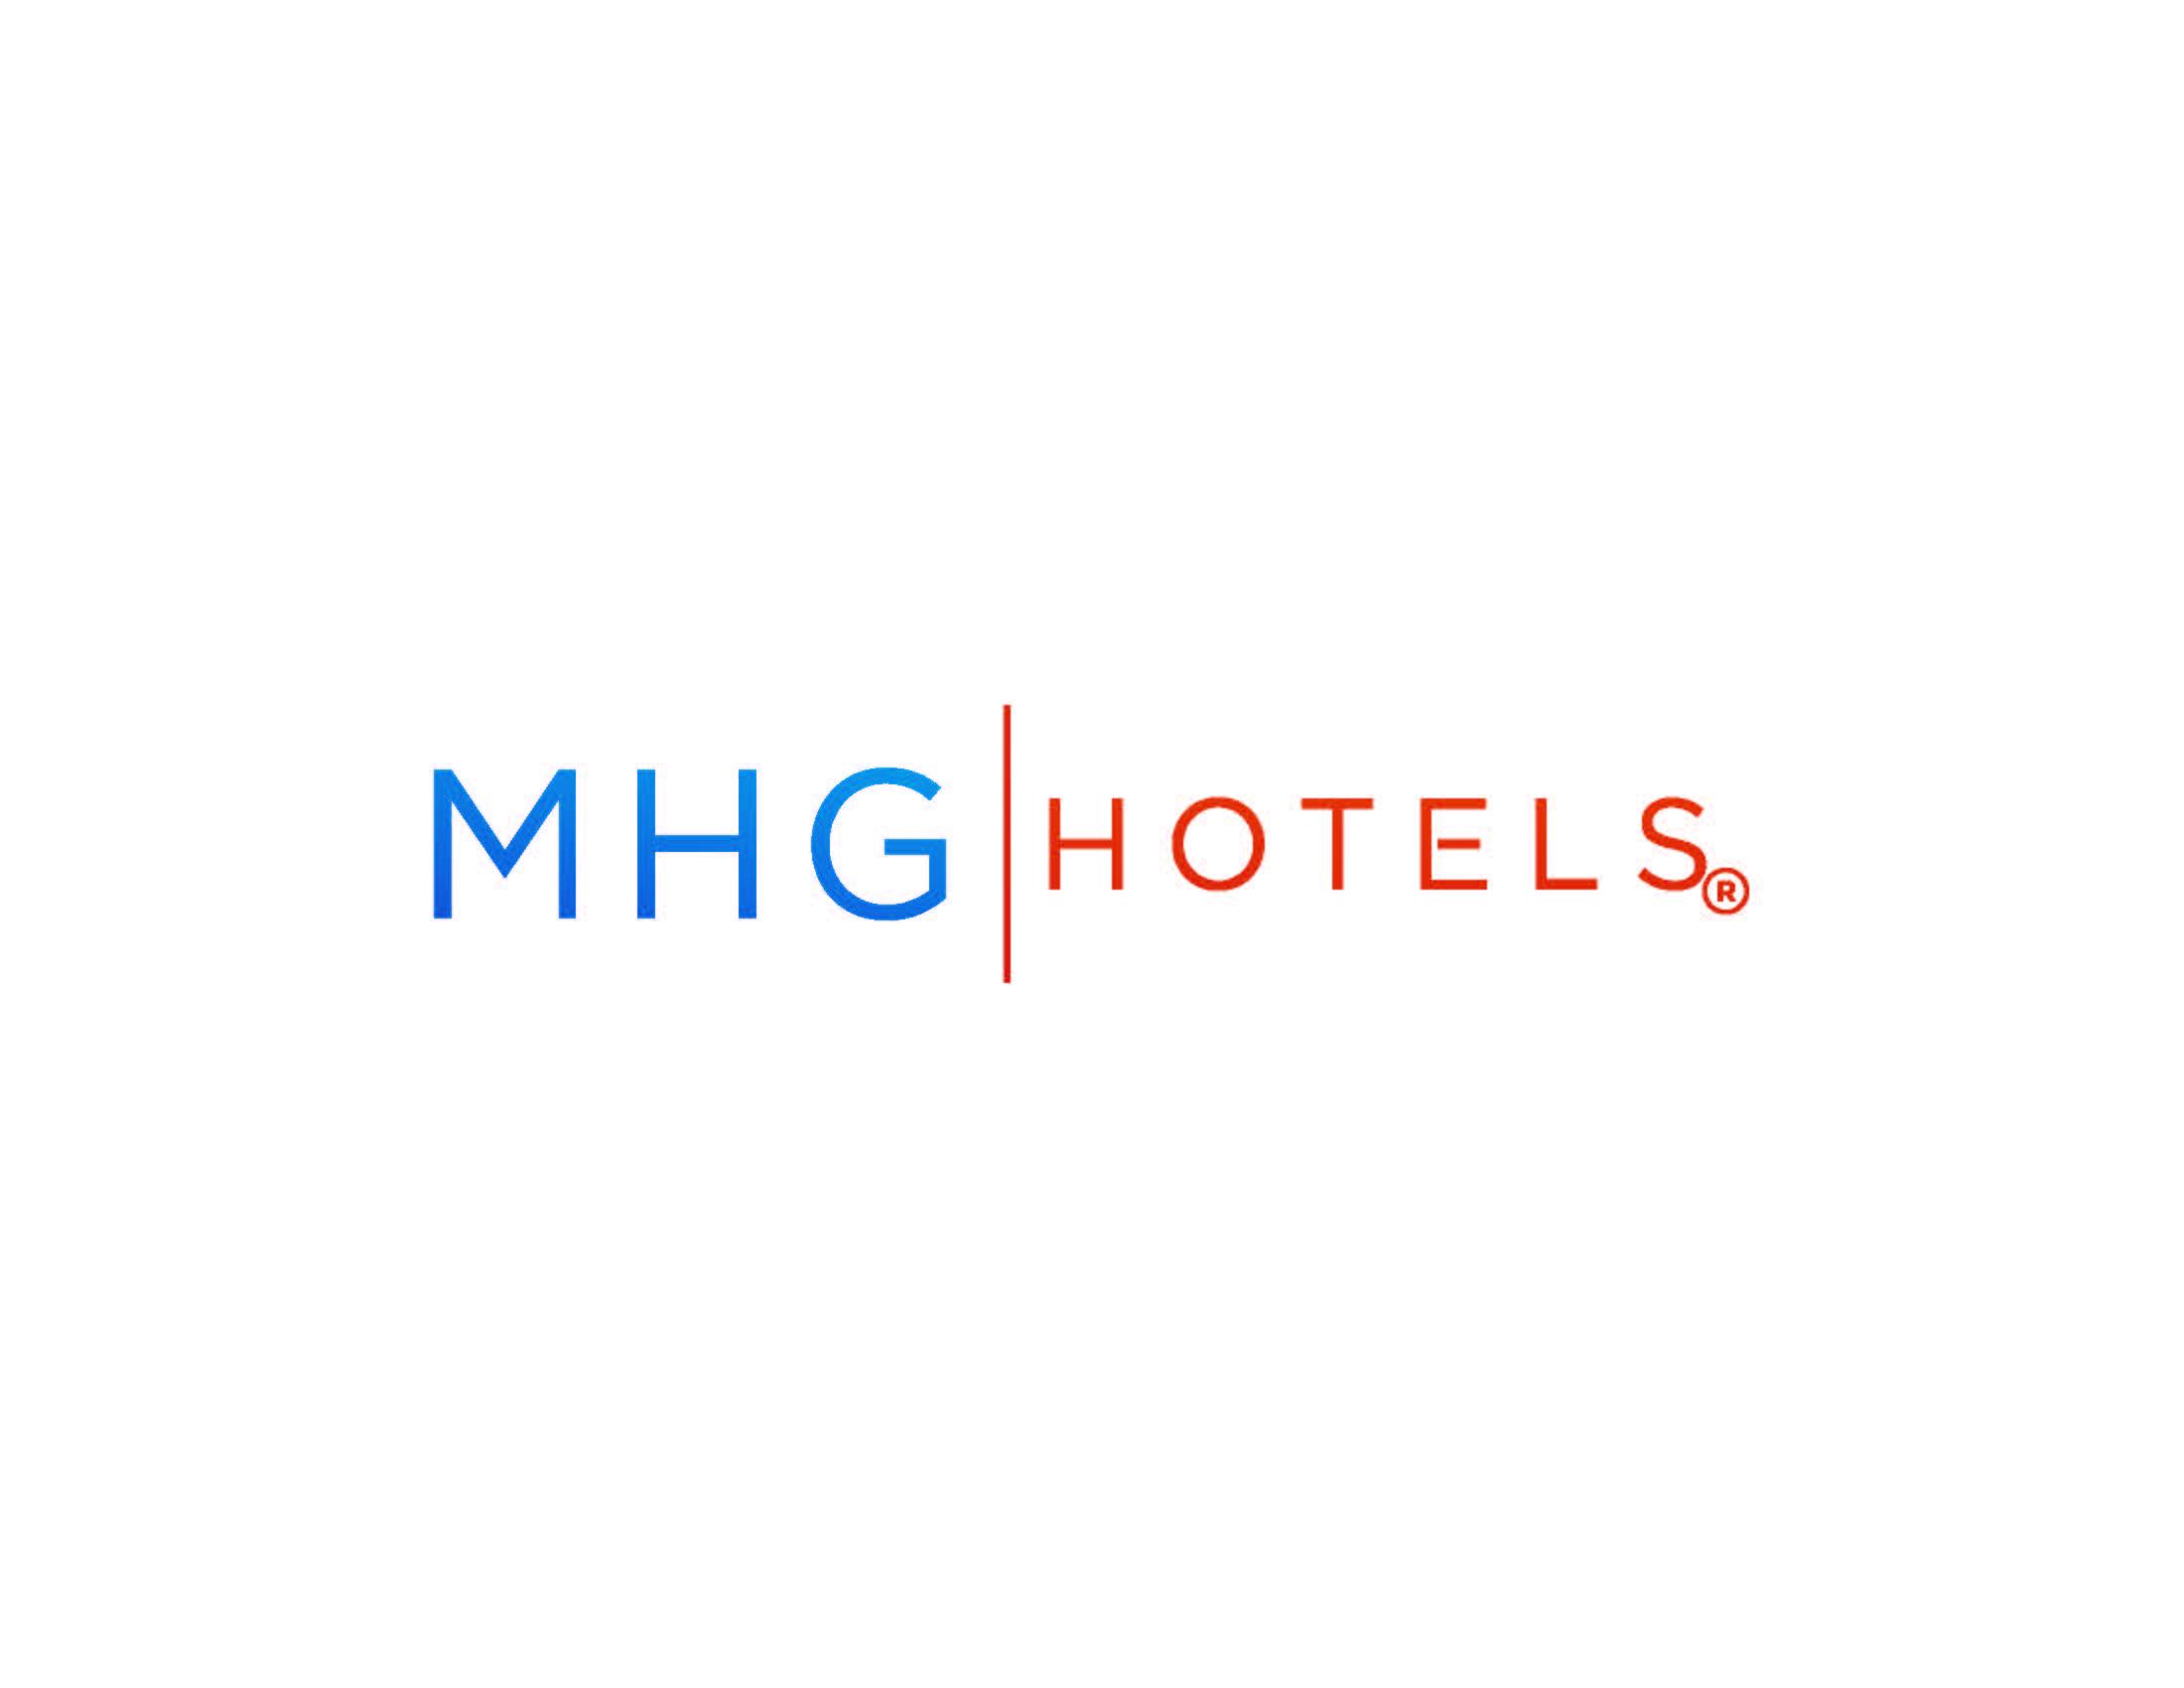 MHG Hotels